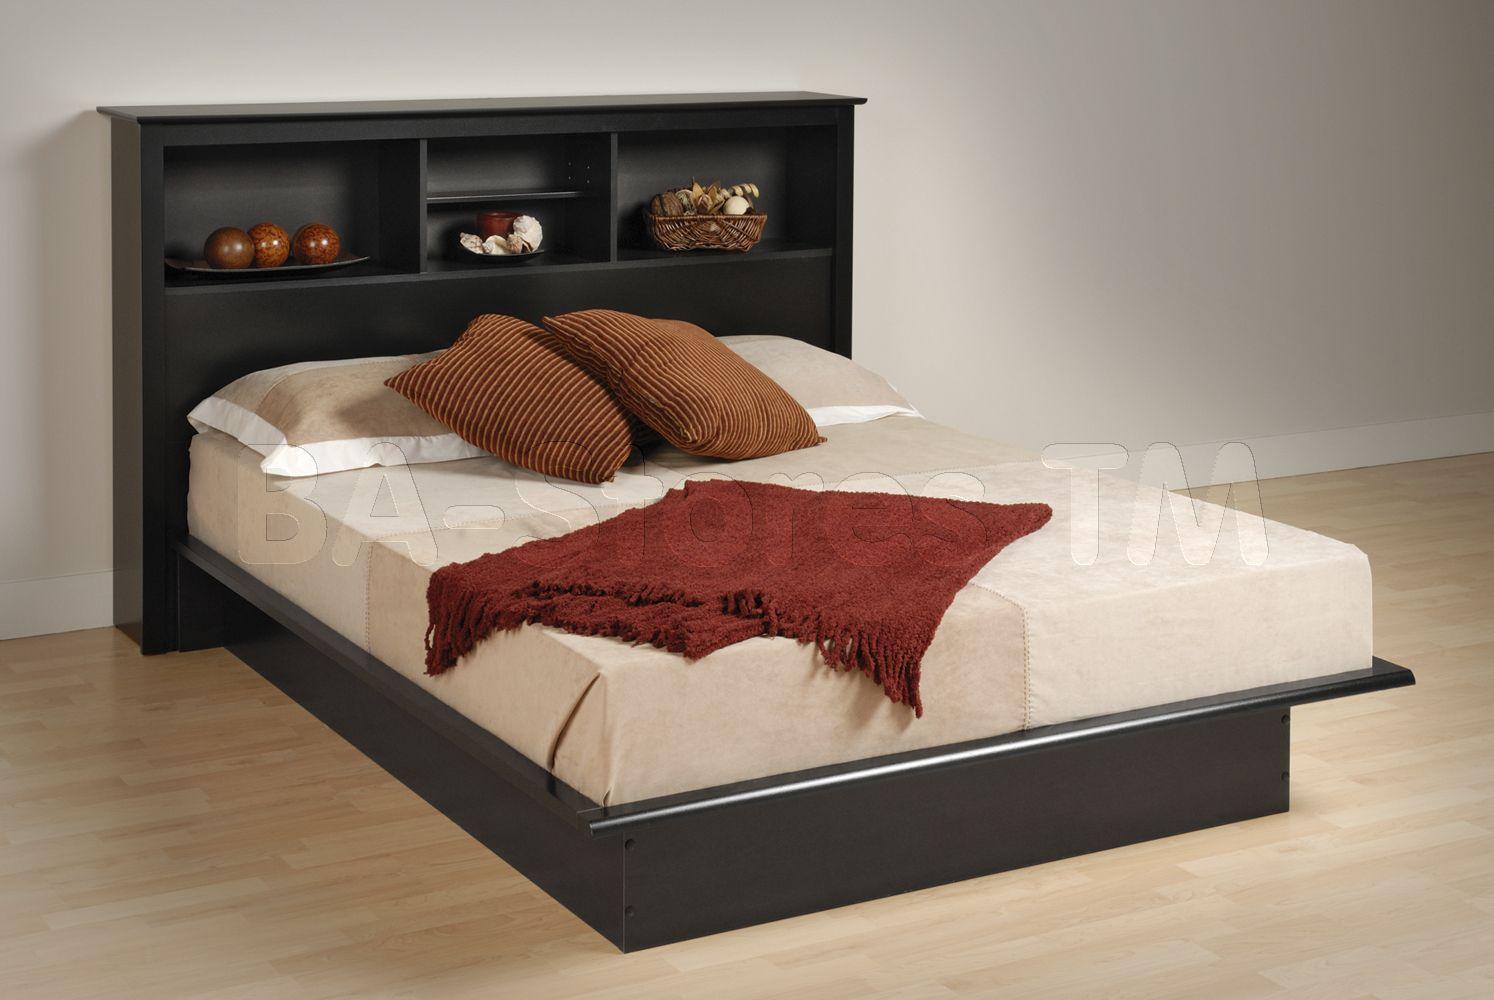 Beds Prepac Black Platform Bed With Bookcase Headboard Bbd 5475